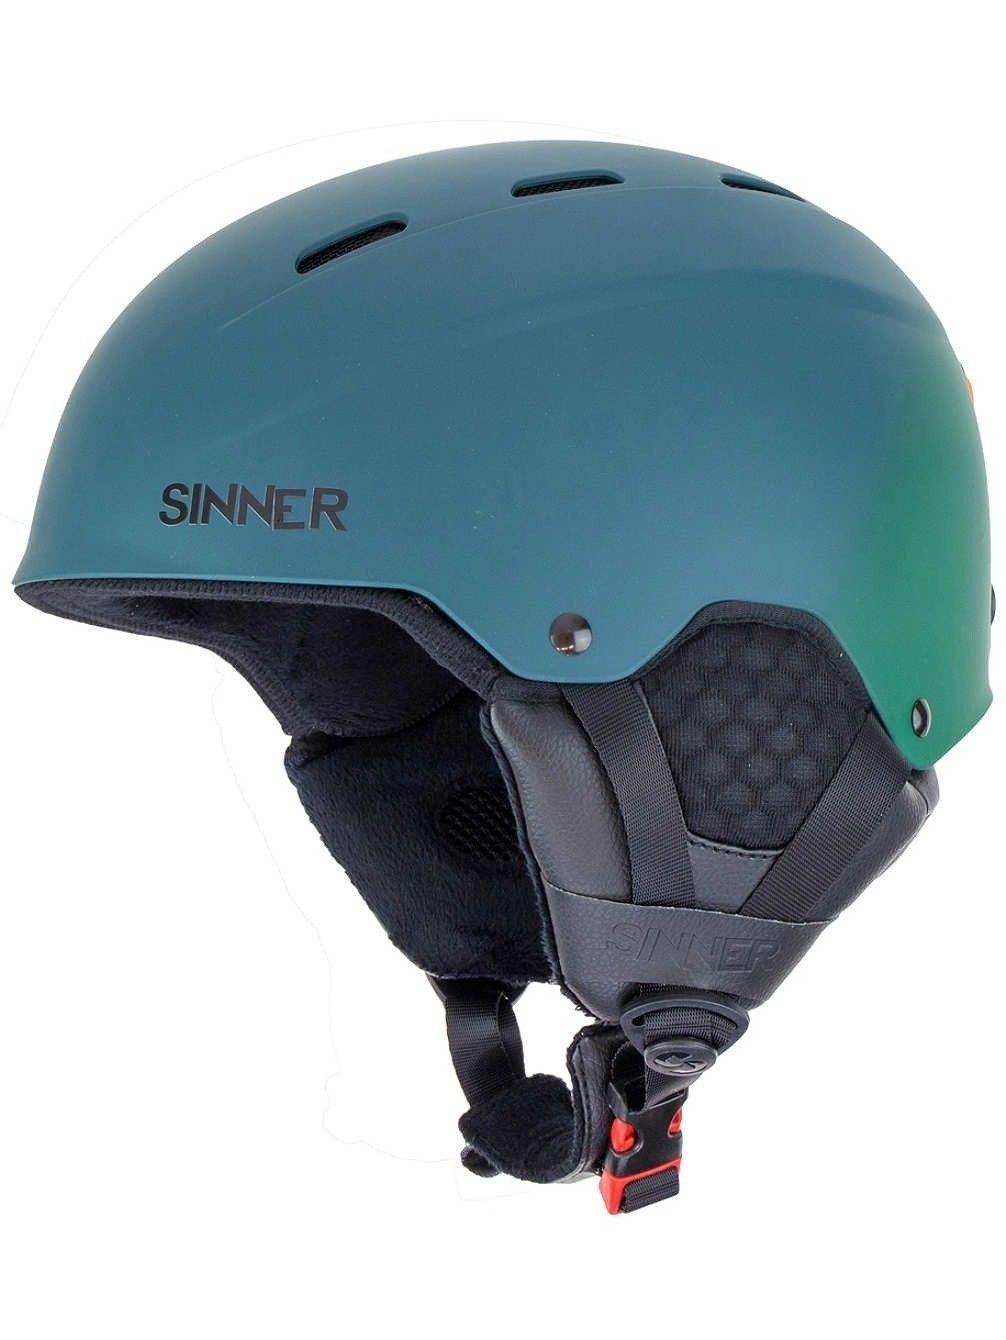 Sinner snowboard skihelm Typhoon